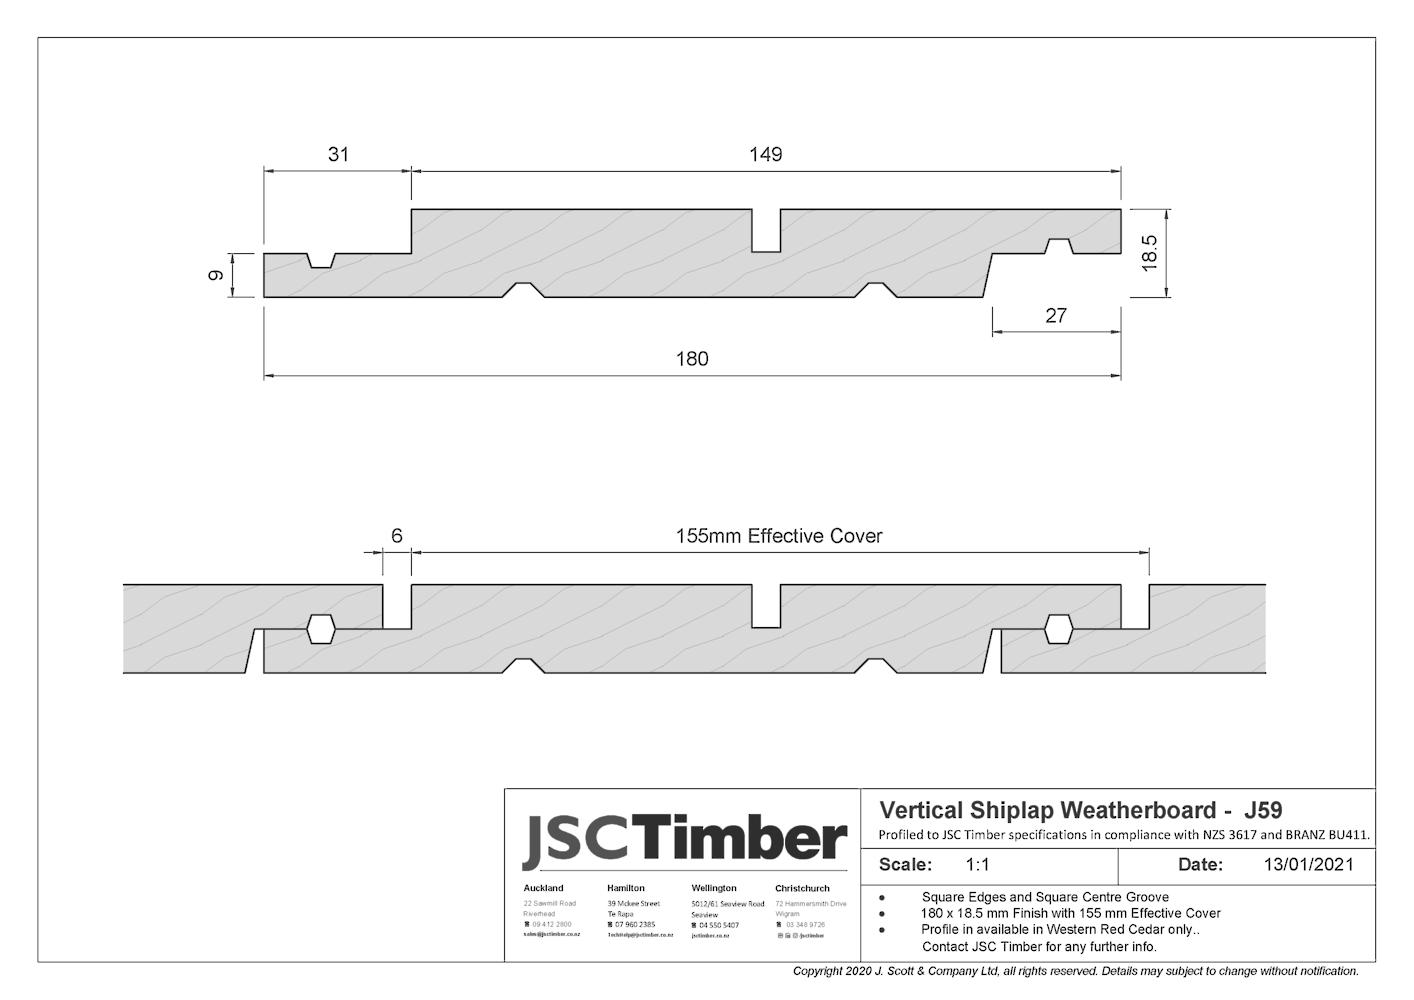 J59 Vertical Shiplap Weatherboard